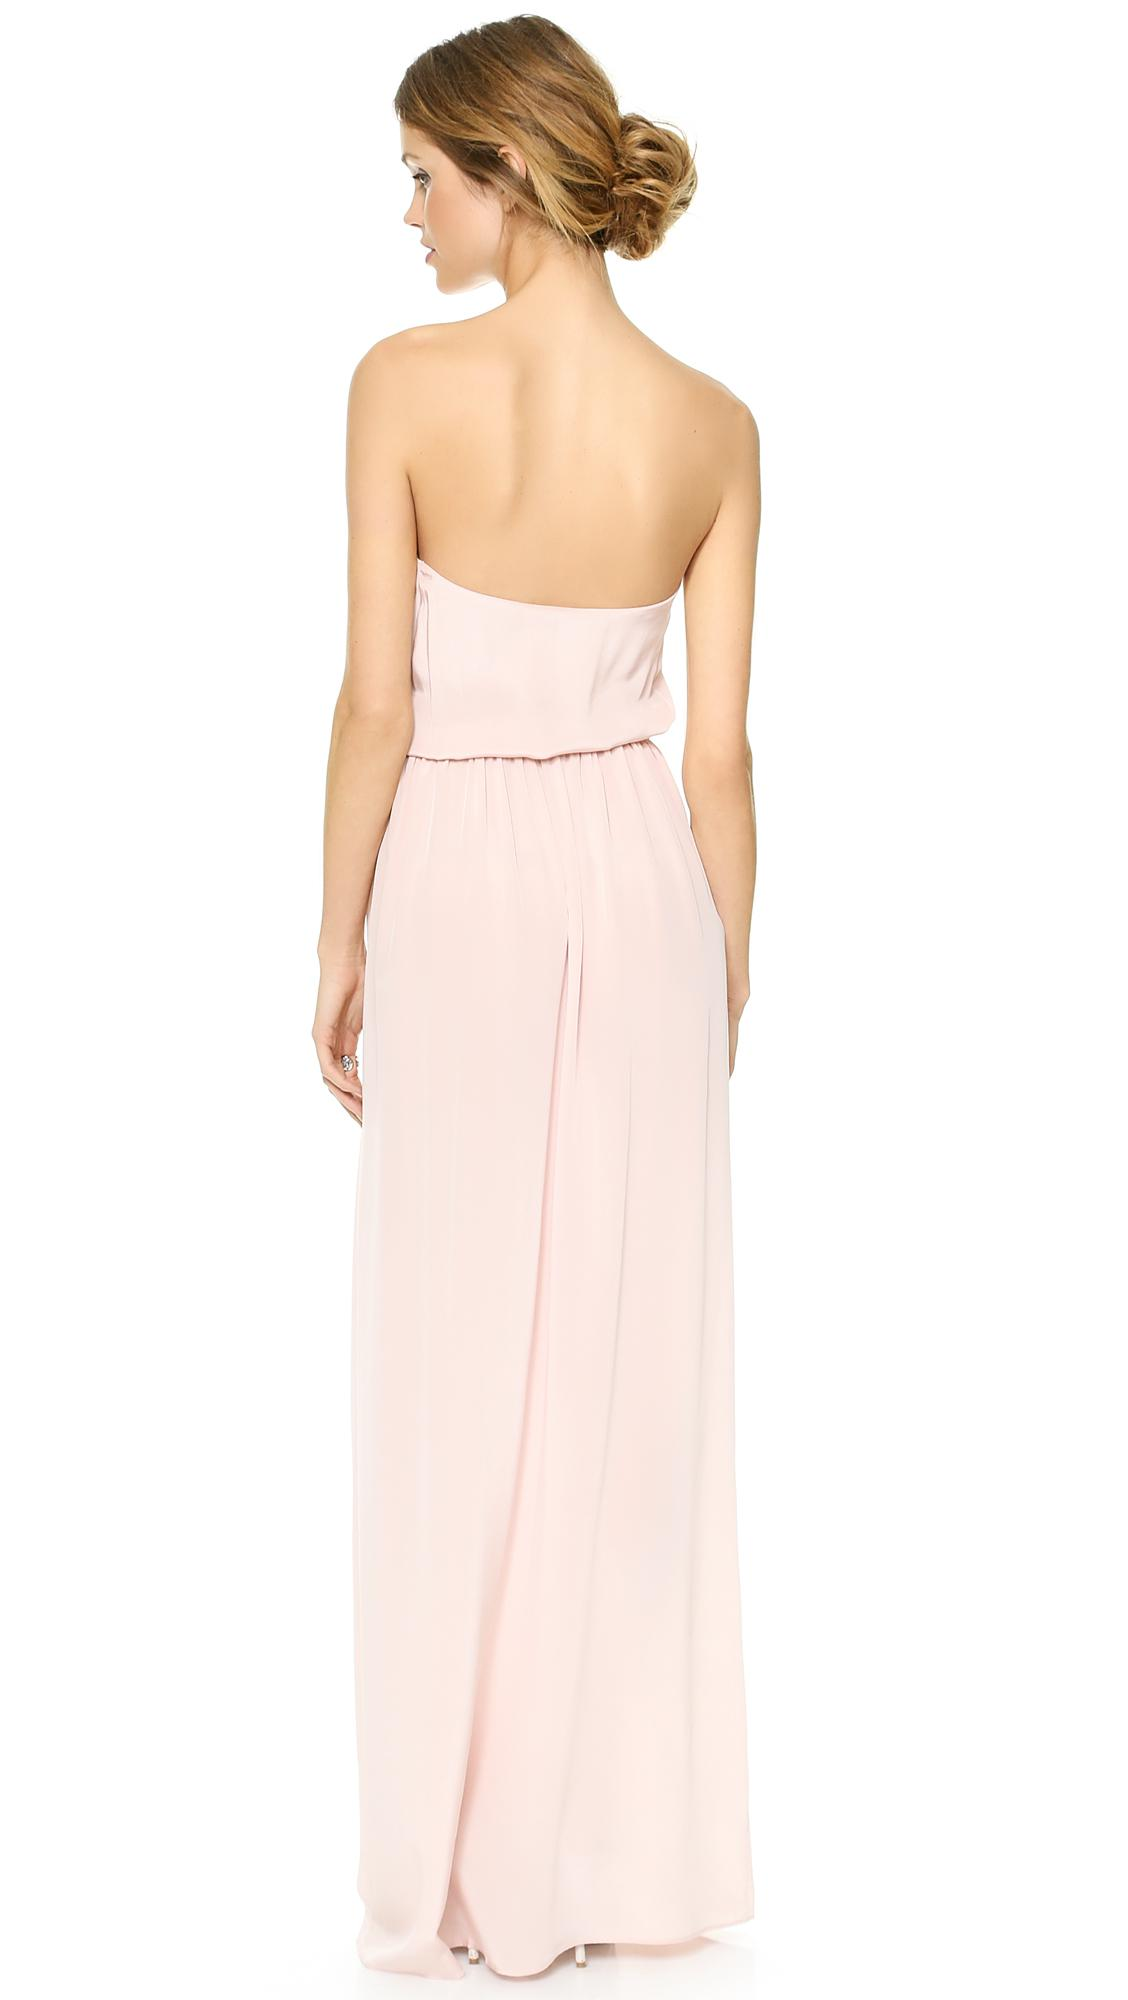 9e56db28fe754 Zimmermann Strapless Draped Maxi Dress in Pink - Lyst